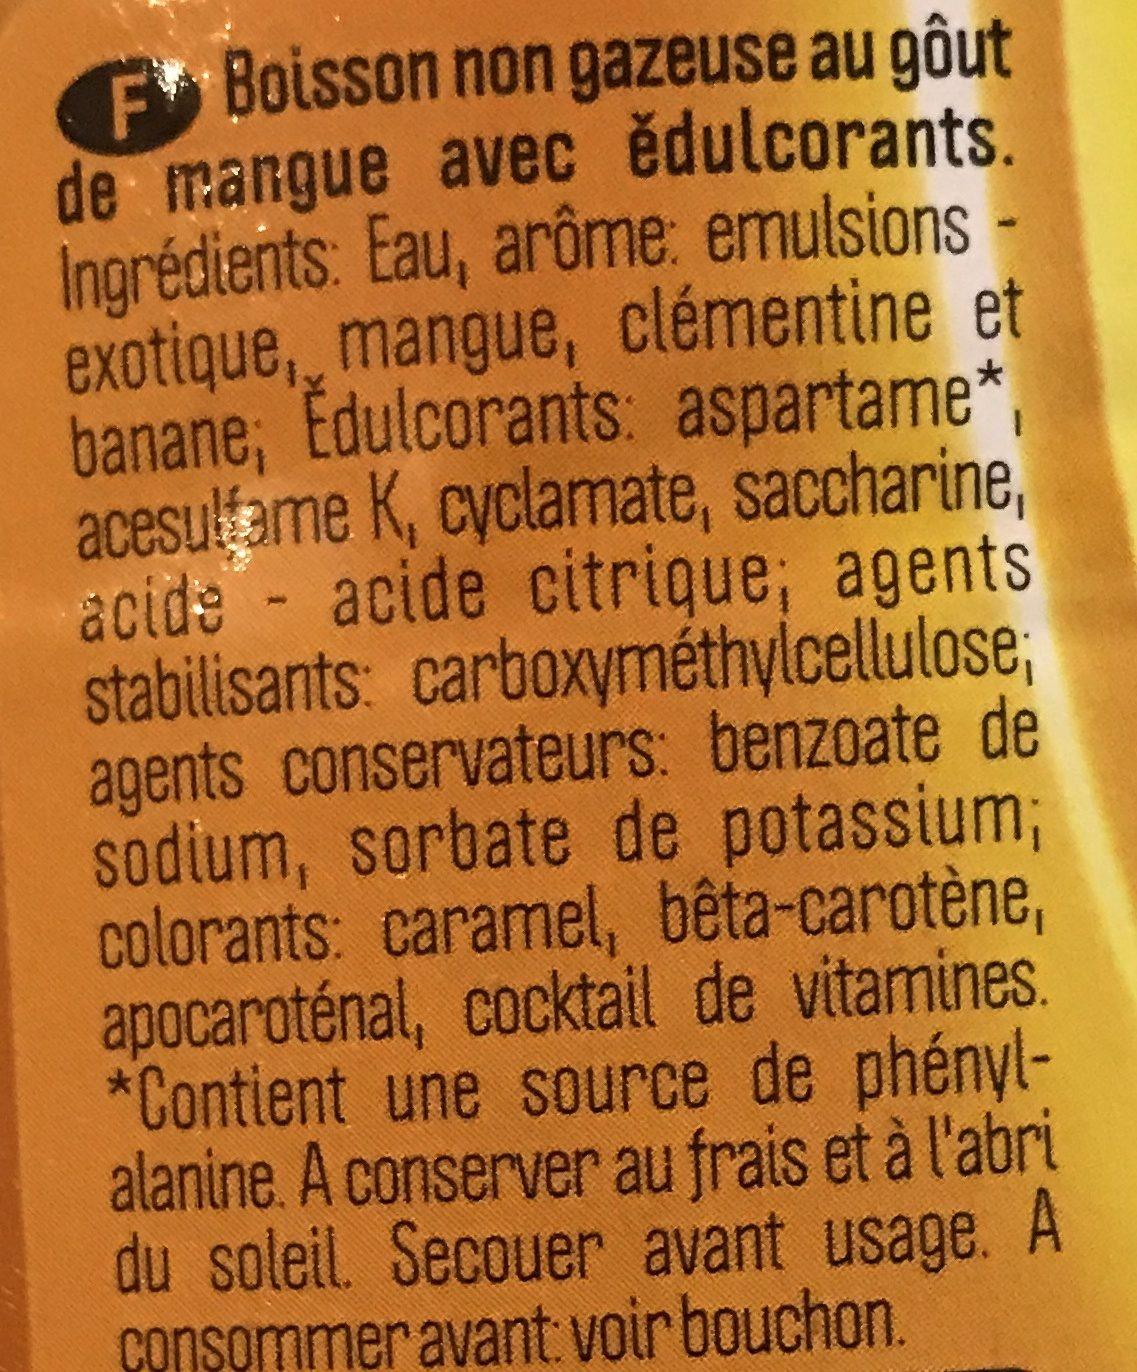 Multivitaminé mangue - Ingredients - fr